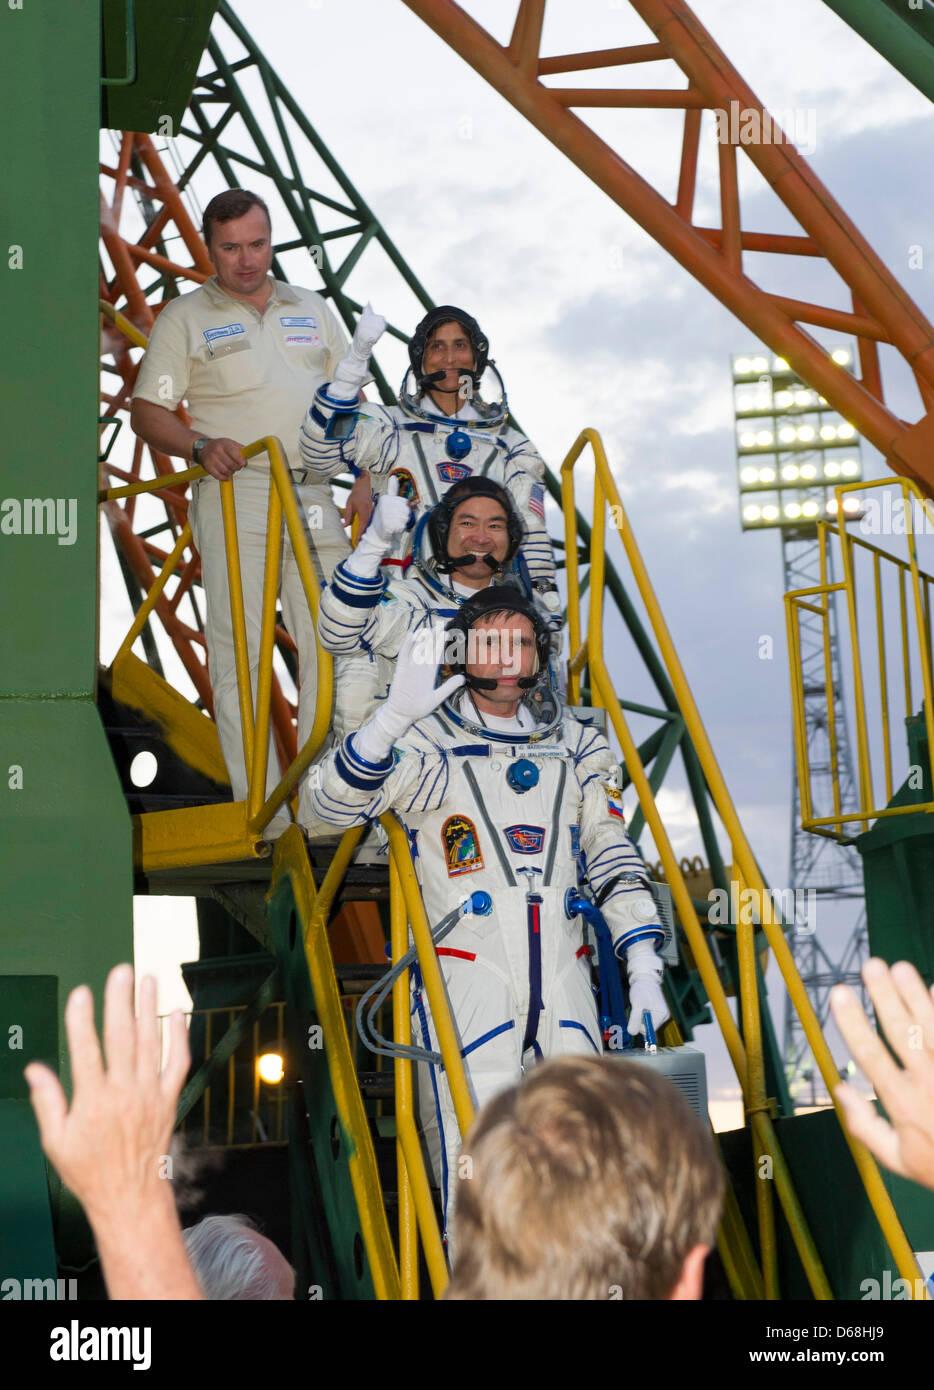 Expedition 32 Soyuz Commander Yuri Malenchenko (bottom), JAXA Flight Engineer Akihiko and NASA Flight Engineer Sunita - Stock Image